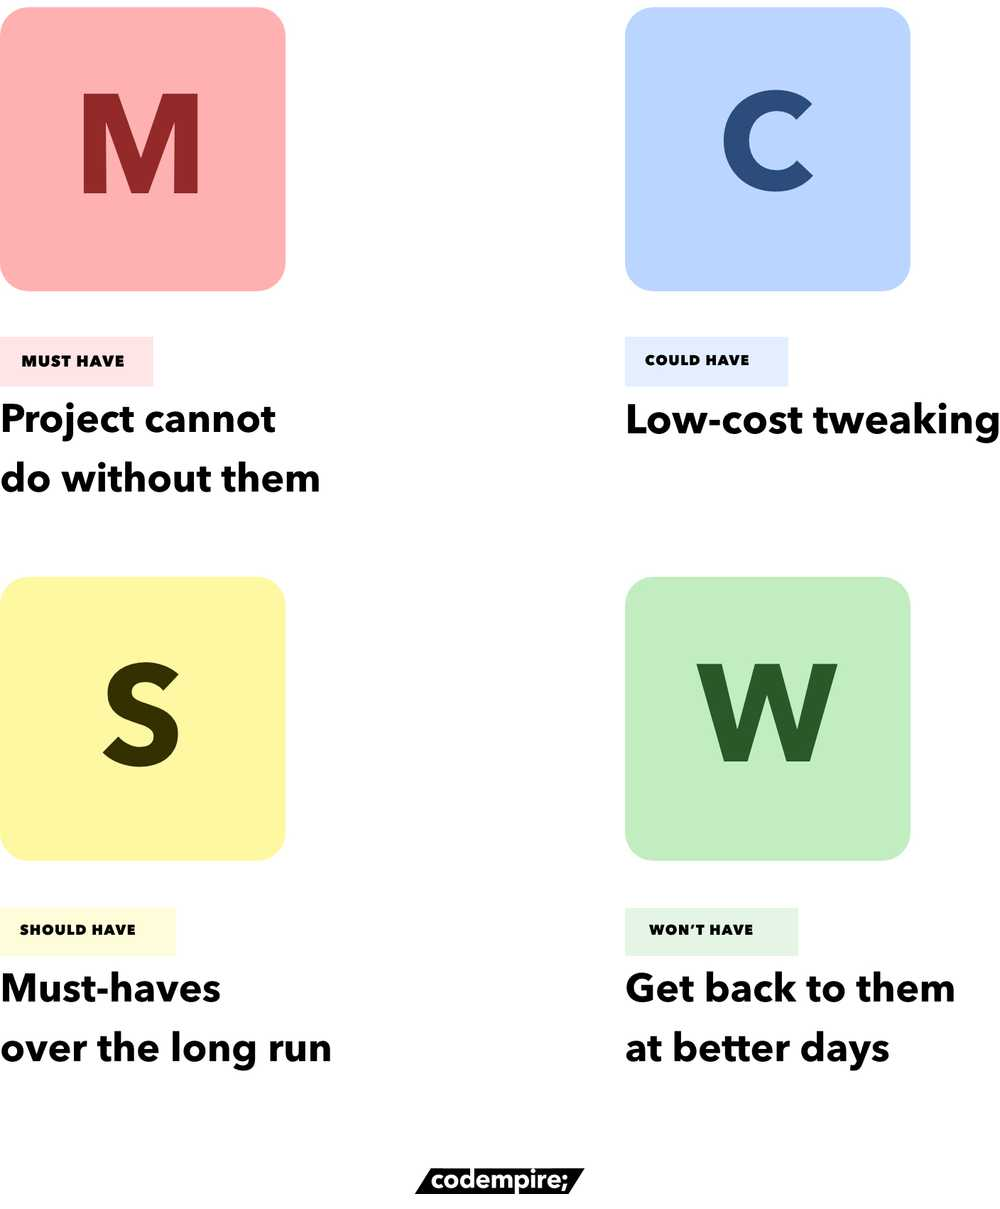 MoSCoW Prioritisation - Codempire